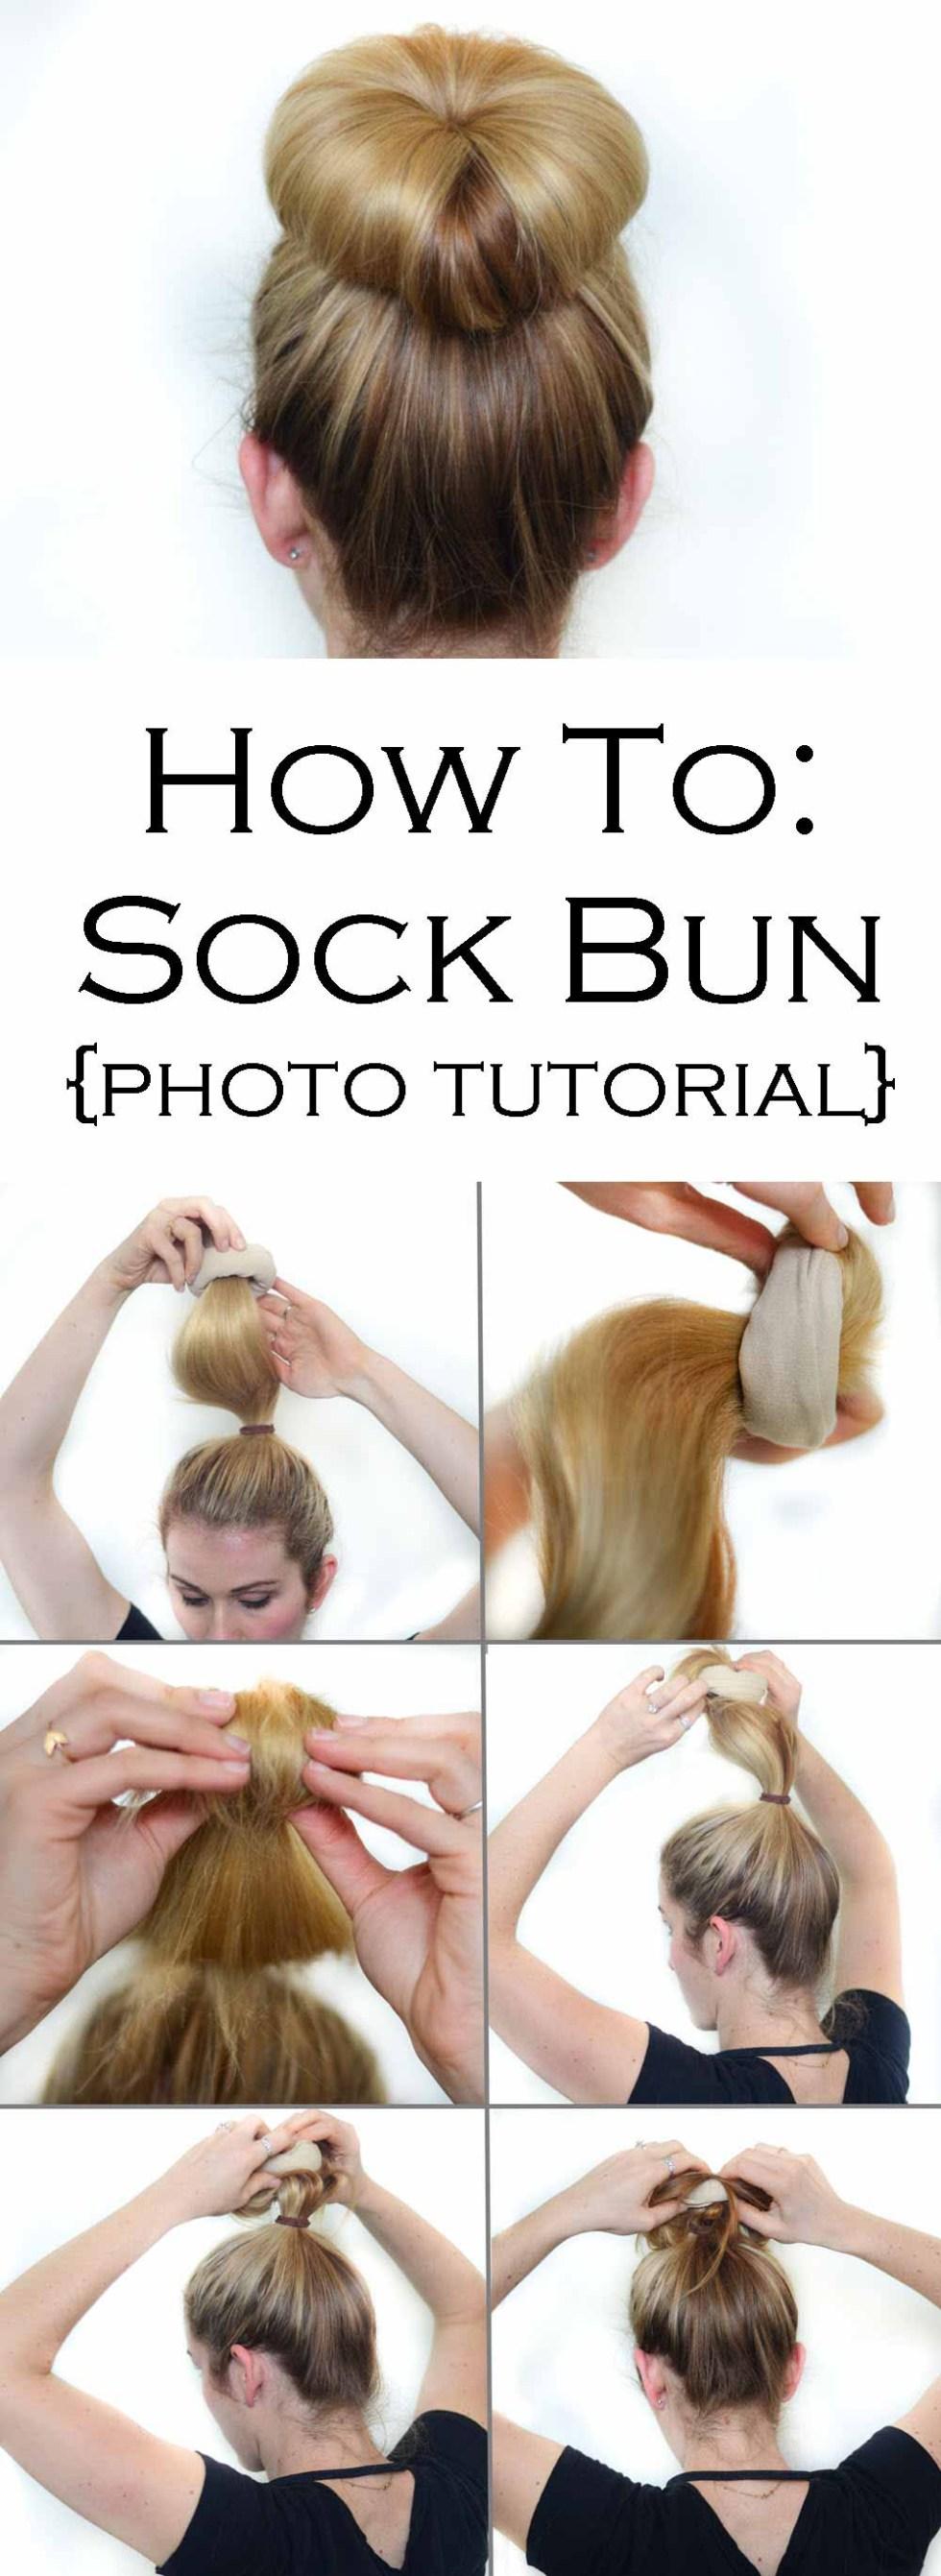 Sock Bun Tutorial #hair #longhair #hairtutorial #sockbun #updo #updotutorial #beautyblog #beautyblogger